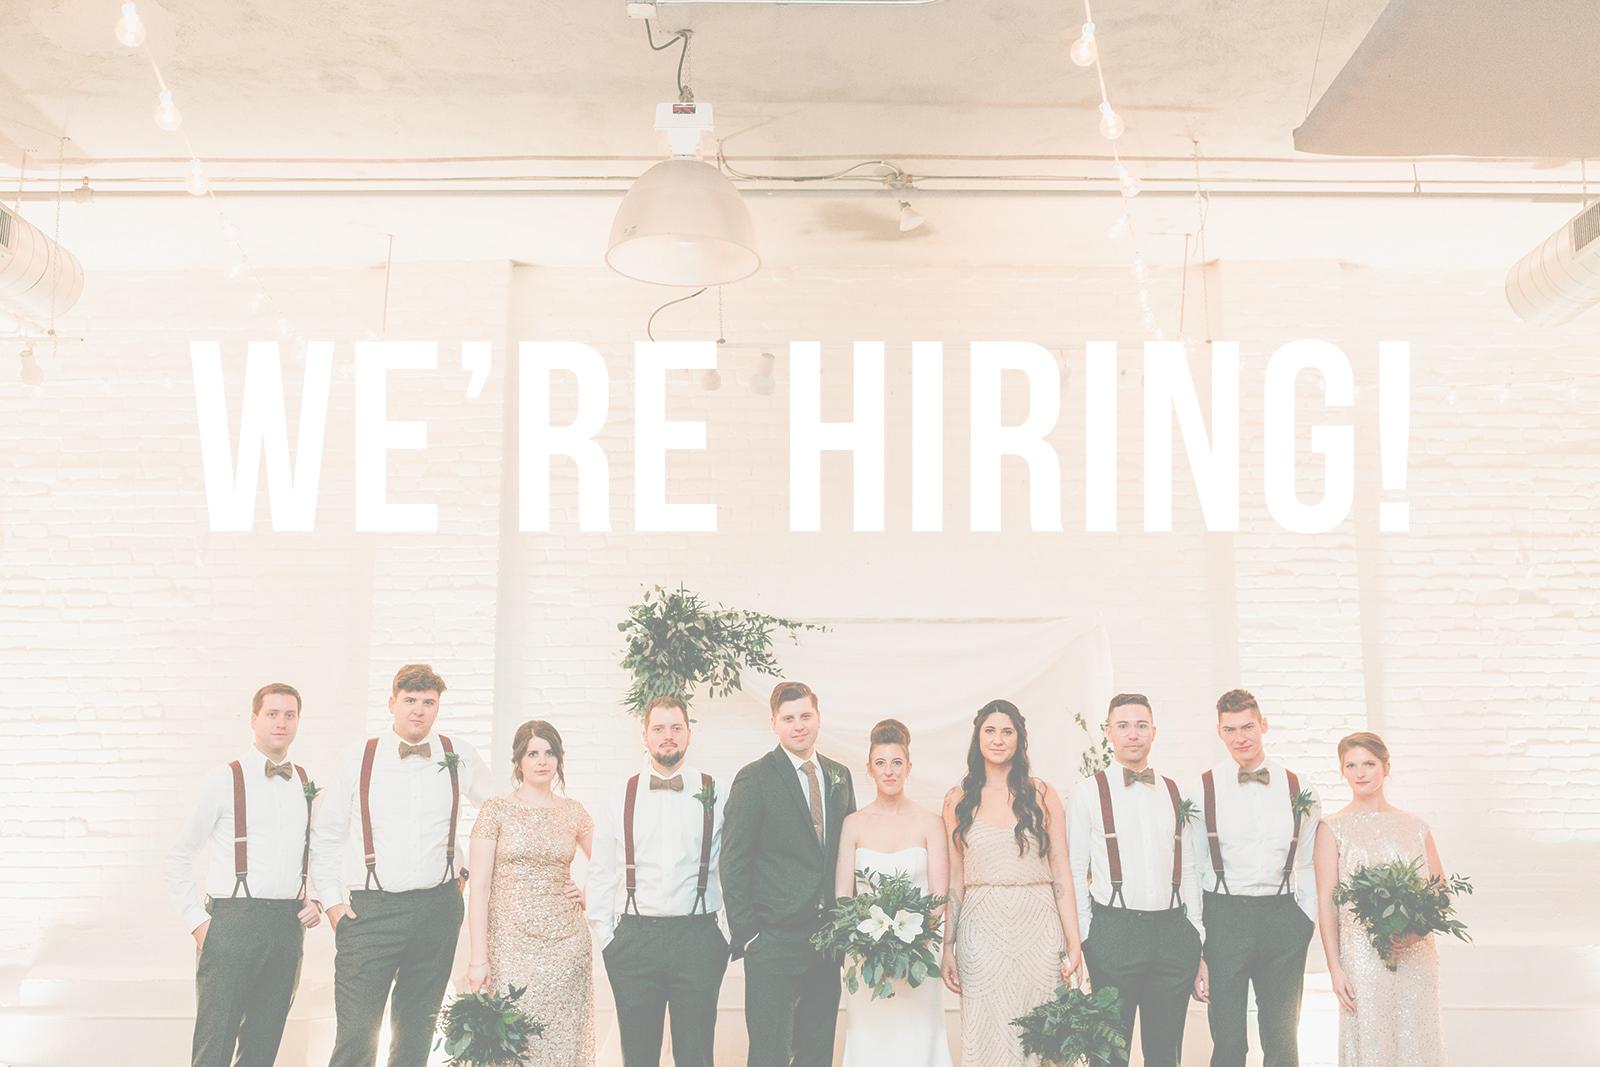 hiring_wedding_photographer.jpg